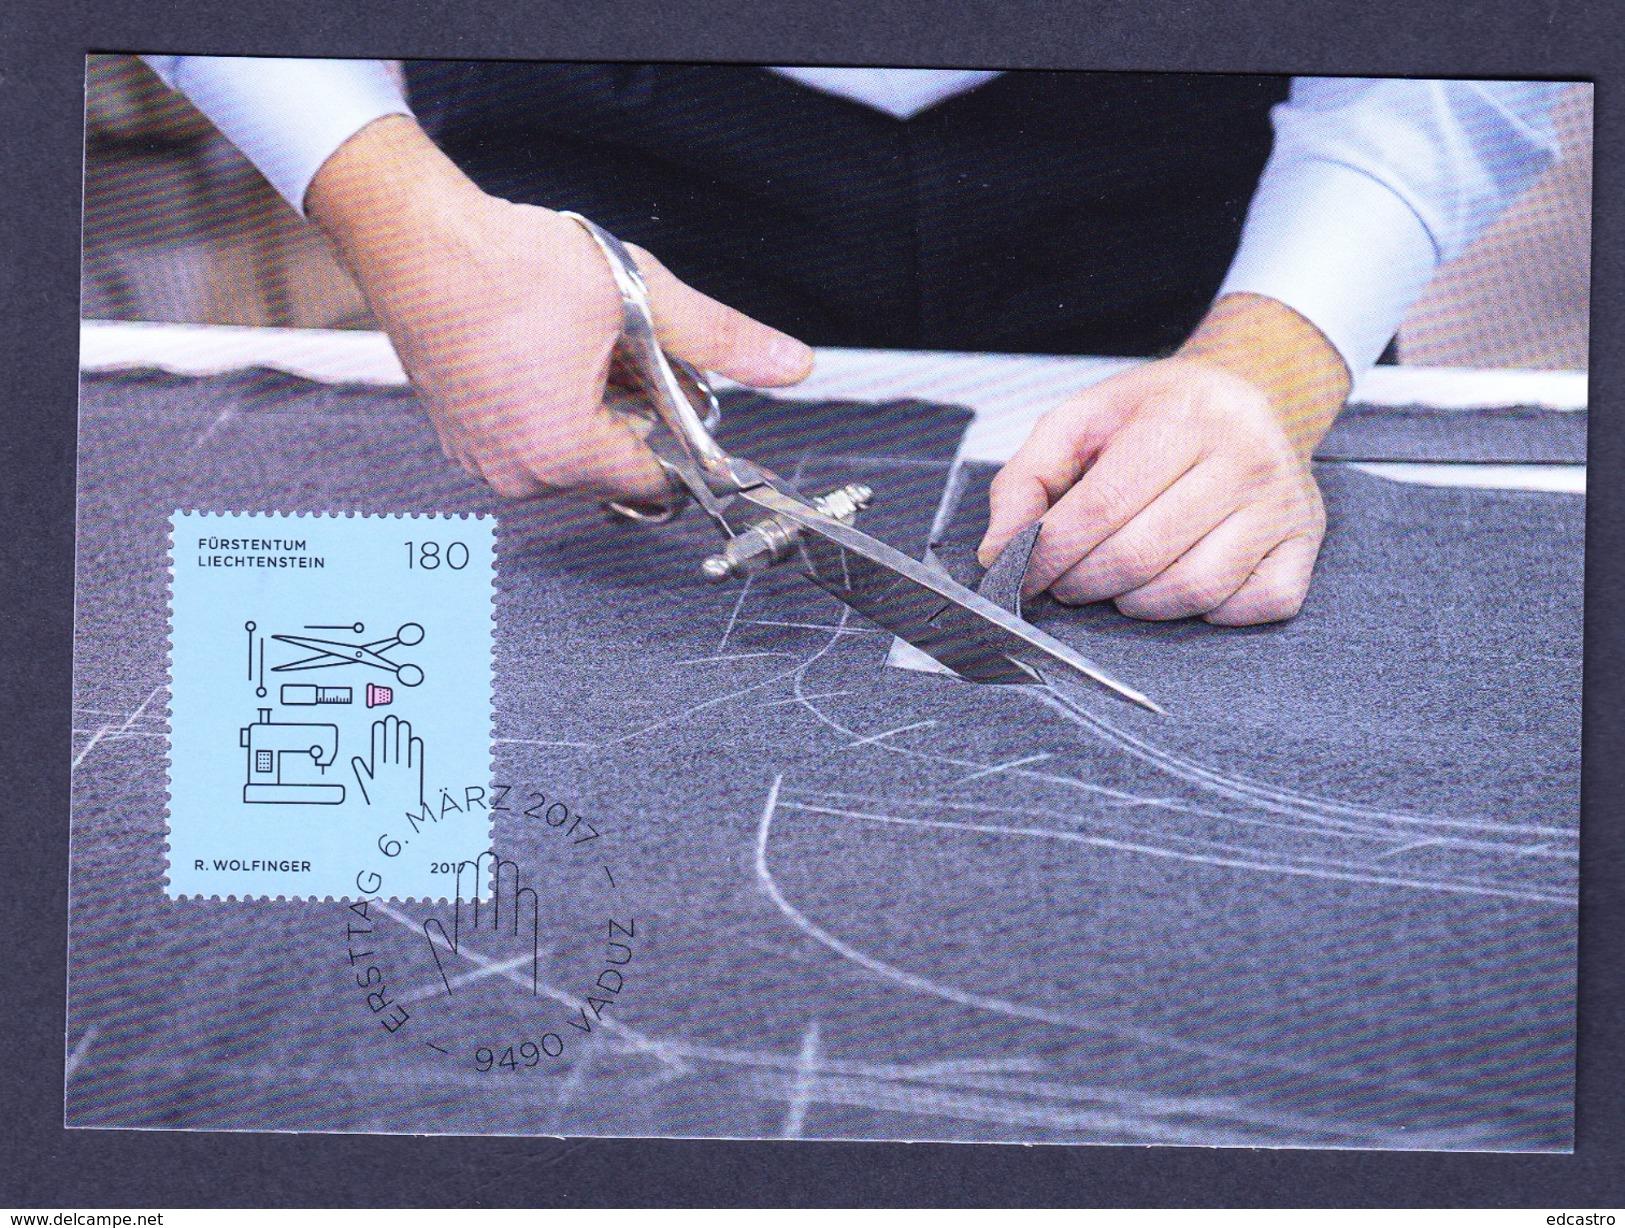 LIECHTENSTEIN 2017 MAXIMUM CARD. SEPAC 2017 - Trades And Crafts  CUTTER - Profesiones